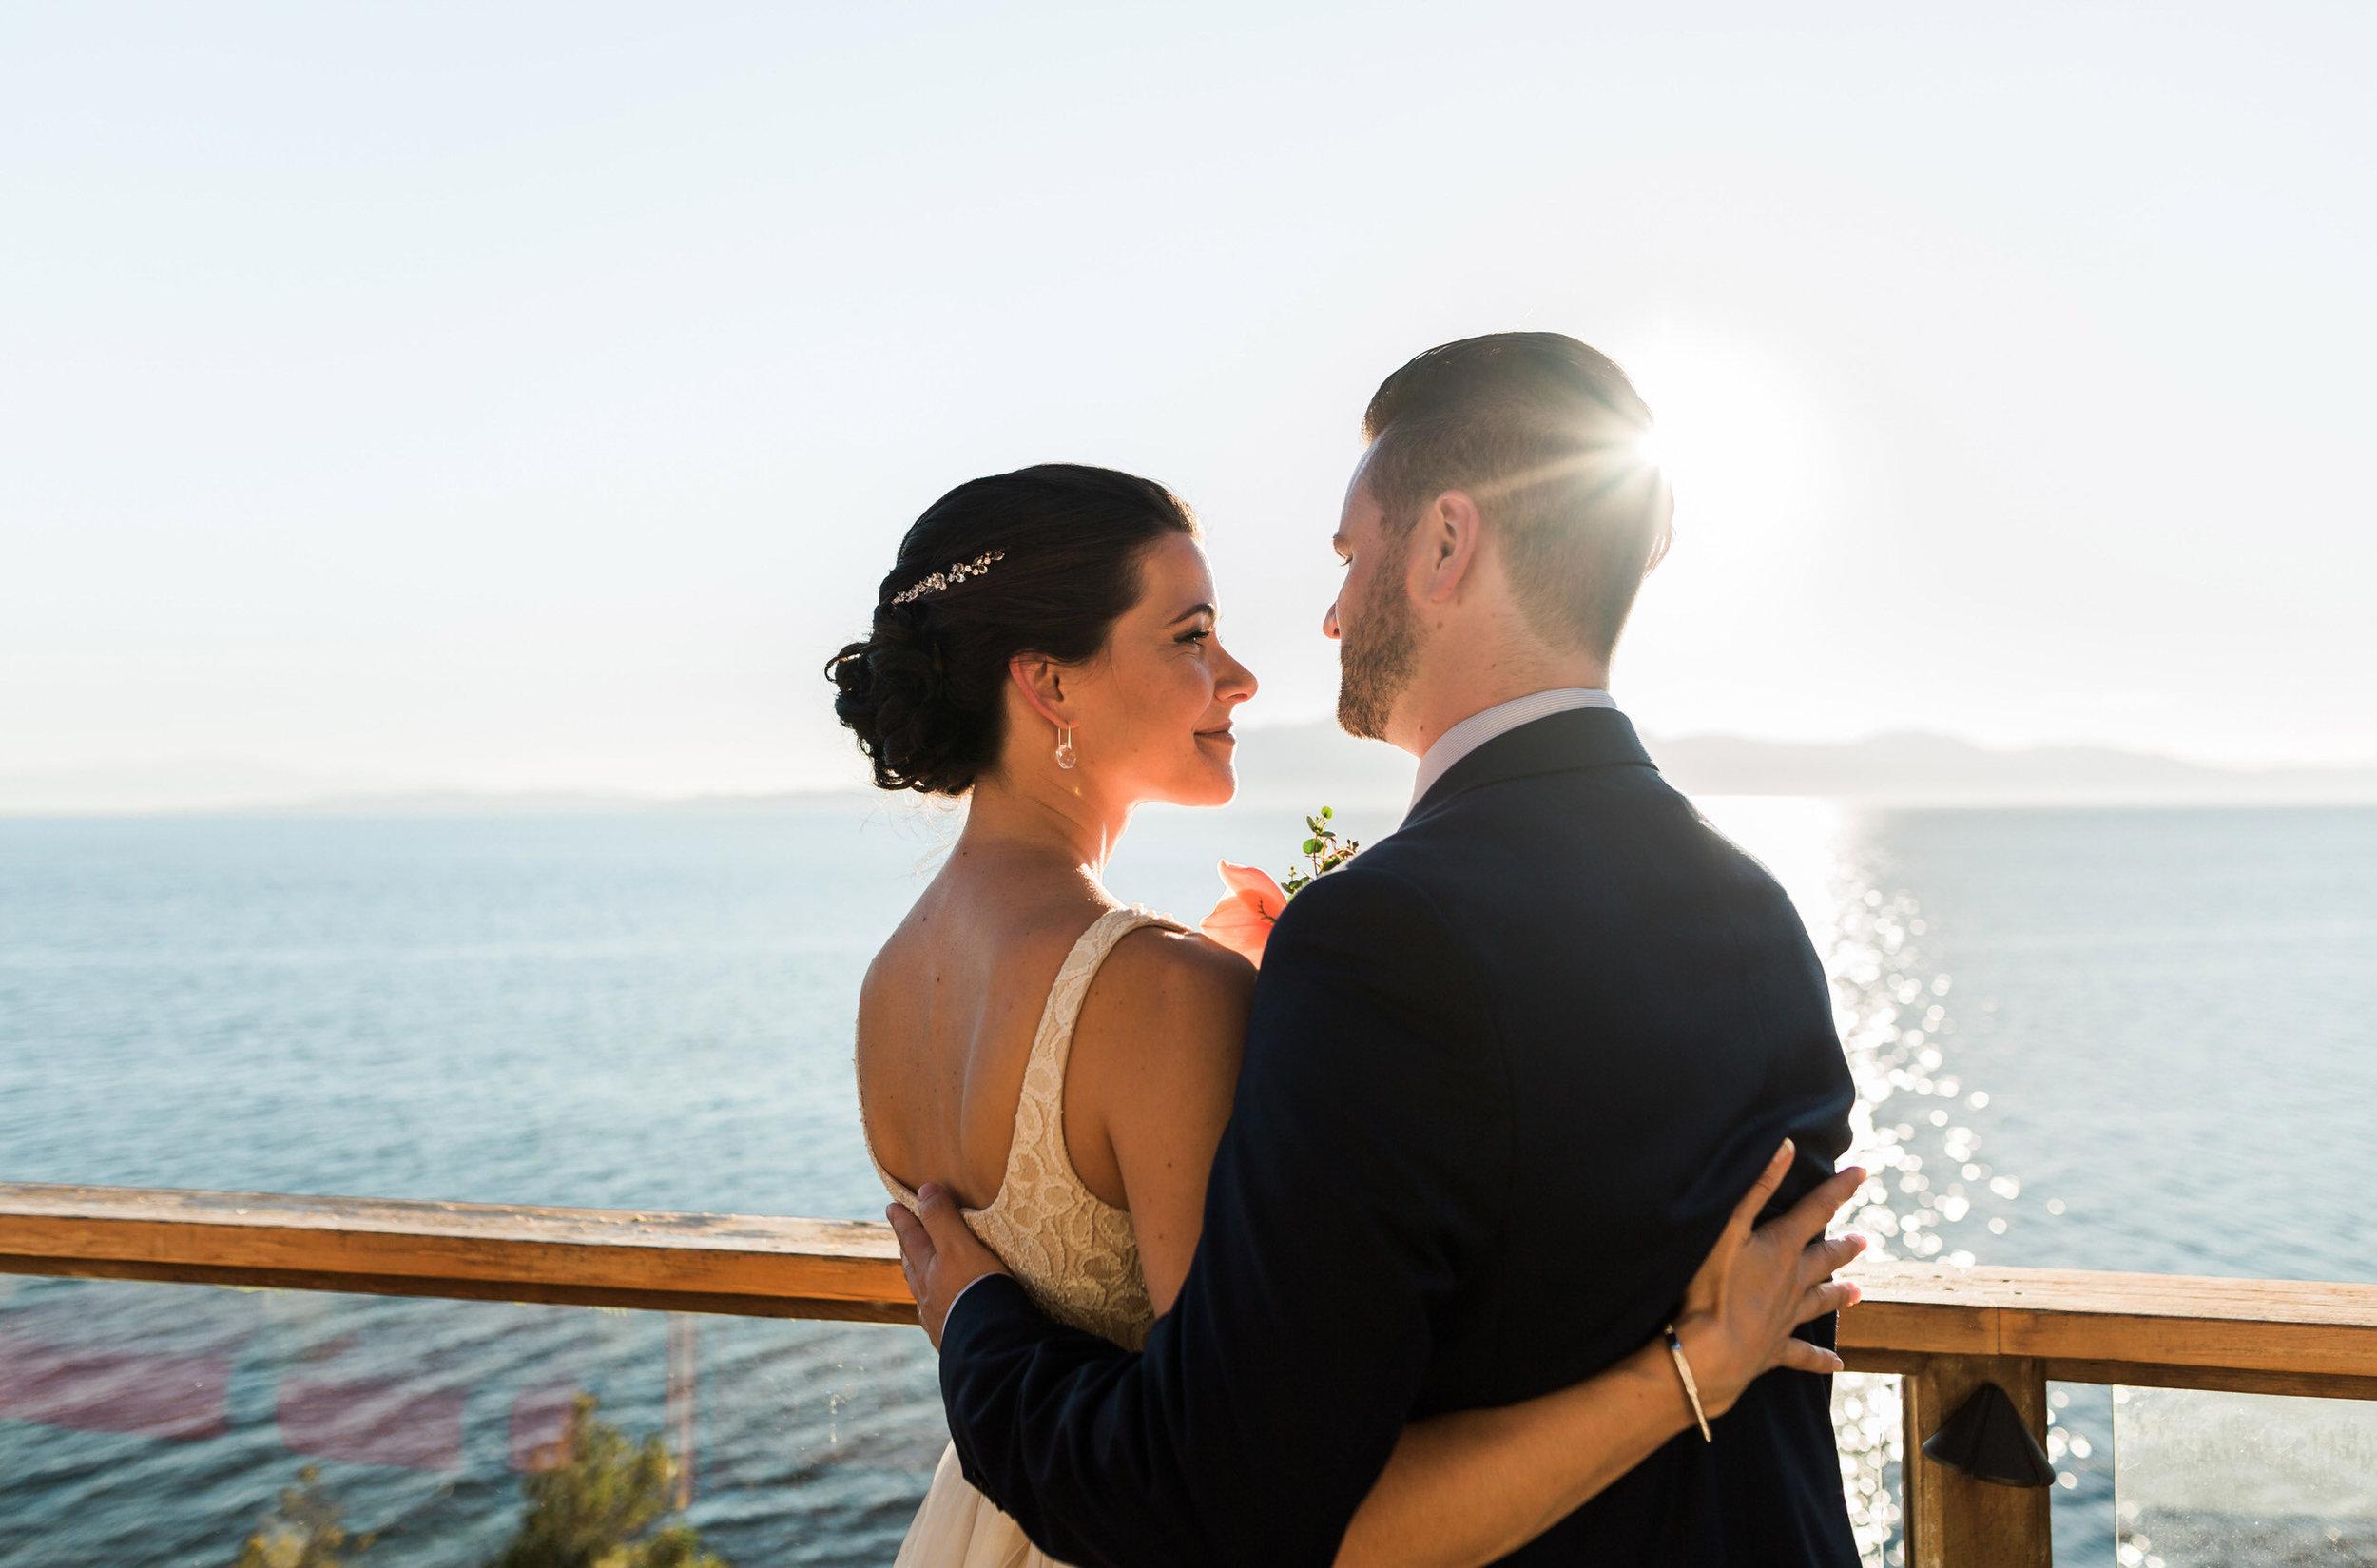 Rockwater Secret Cove Resort Wedding - Sunshine Coast BC Wedding Photographer - Vancouver Wedding Photographer - Sunshine Coast Elopement Photos - IMG_0686.jpg